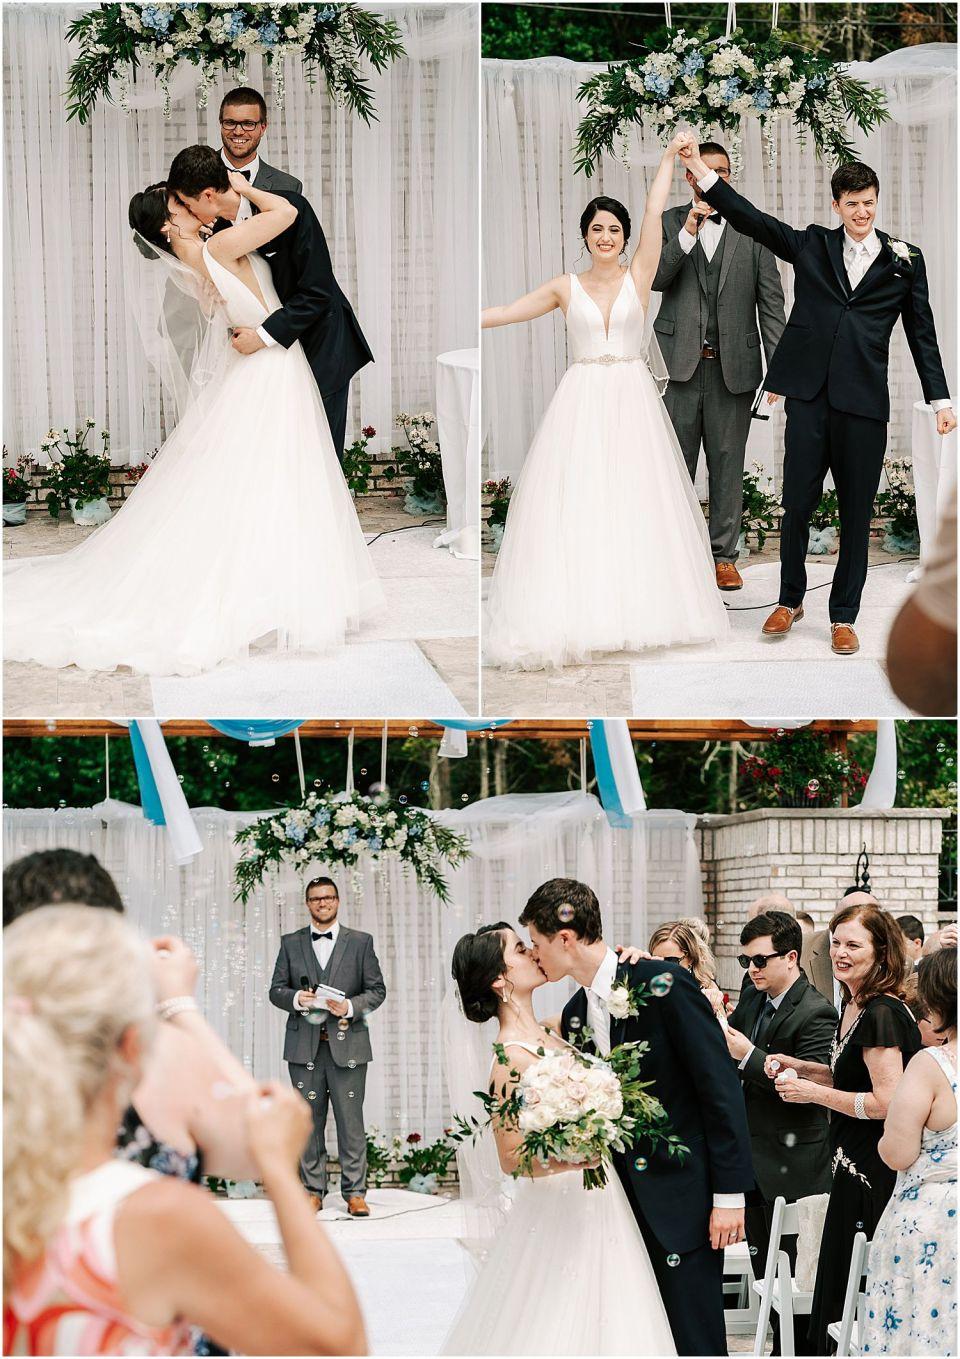 Wedding ceremony at The Grove at Centerton wedding venue